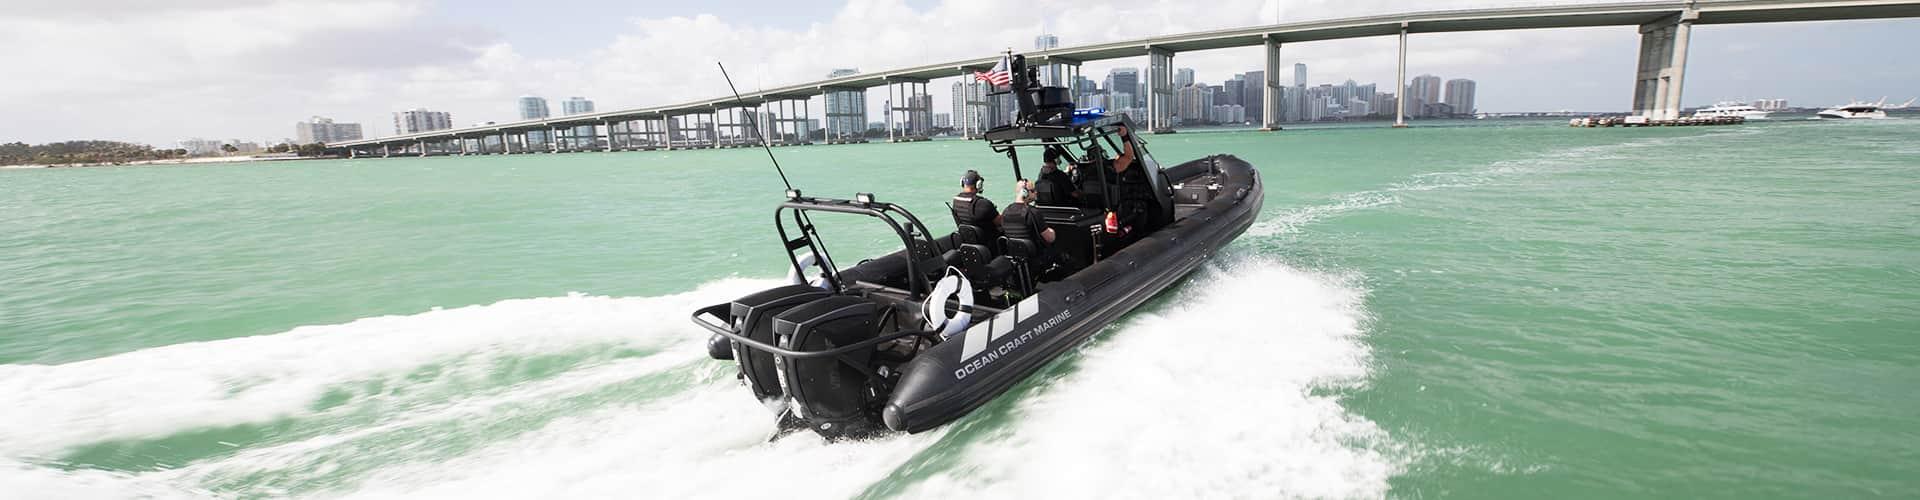 coast guard rigid hull inflatable boats